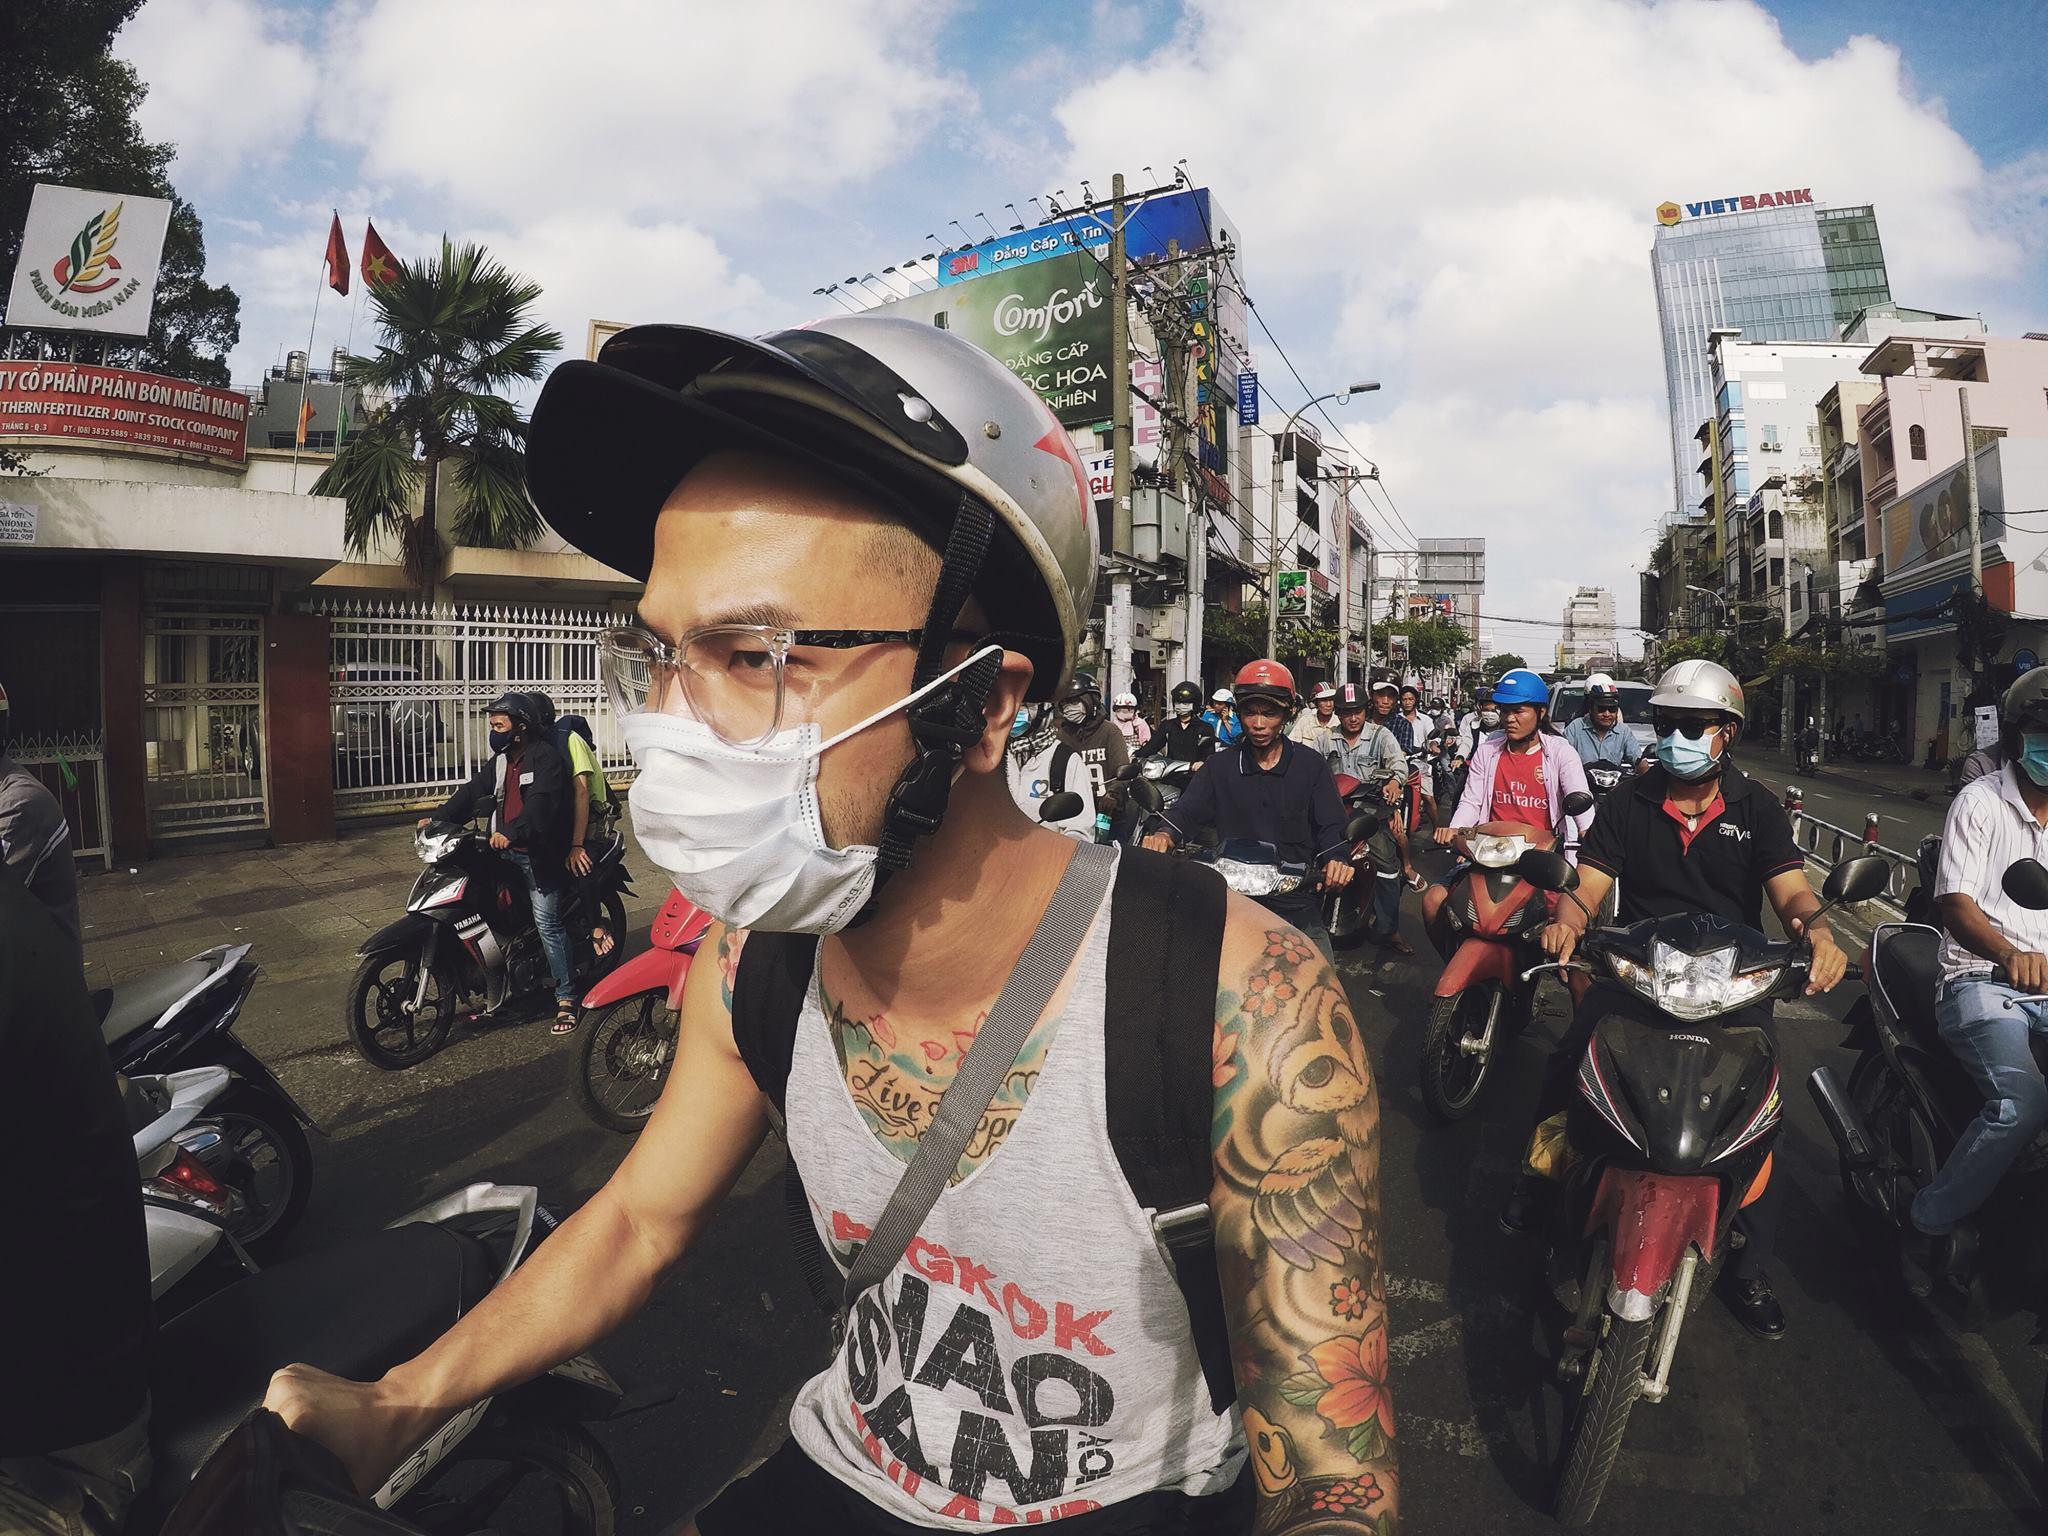 Blending in somewhere in Vietnam.